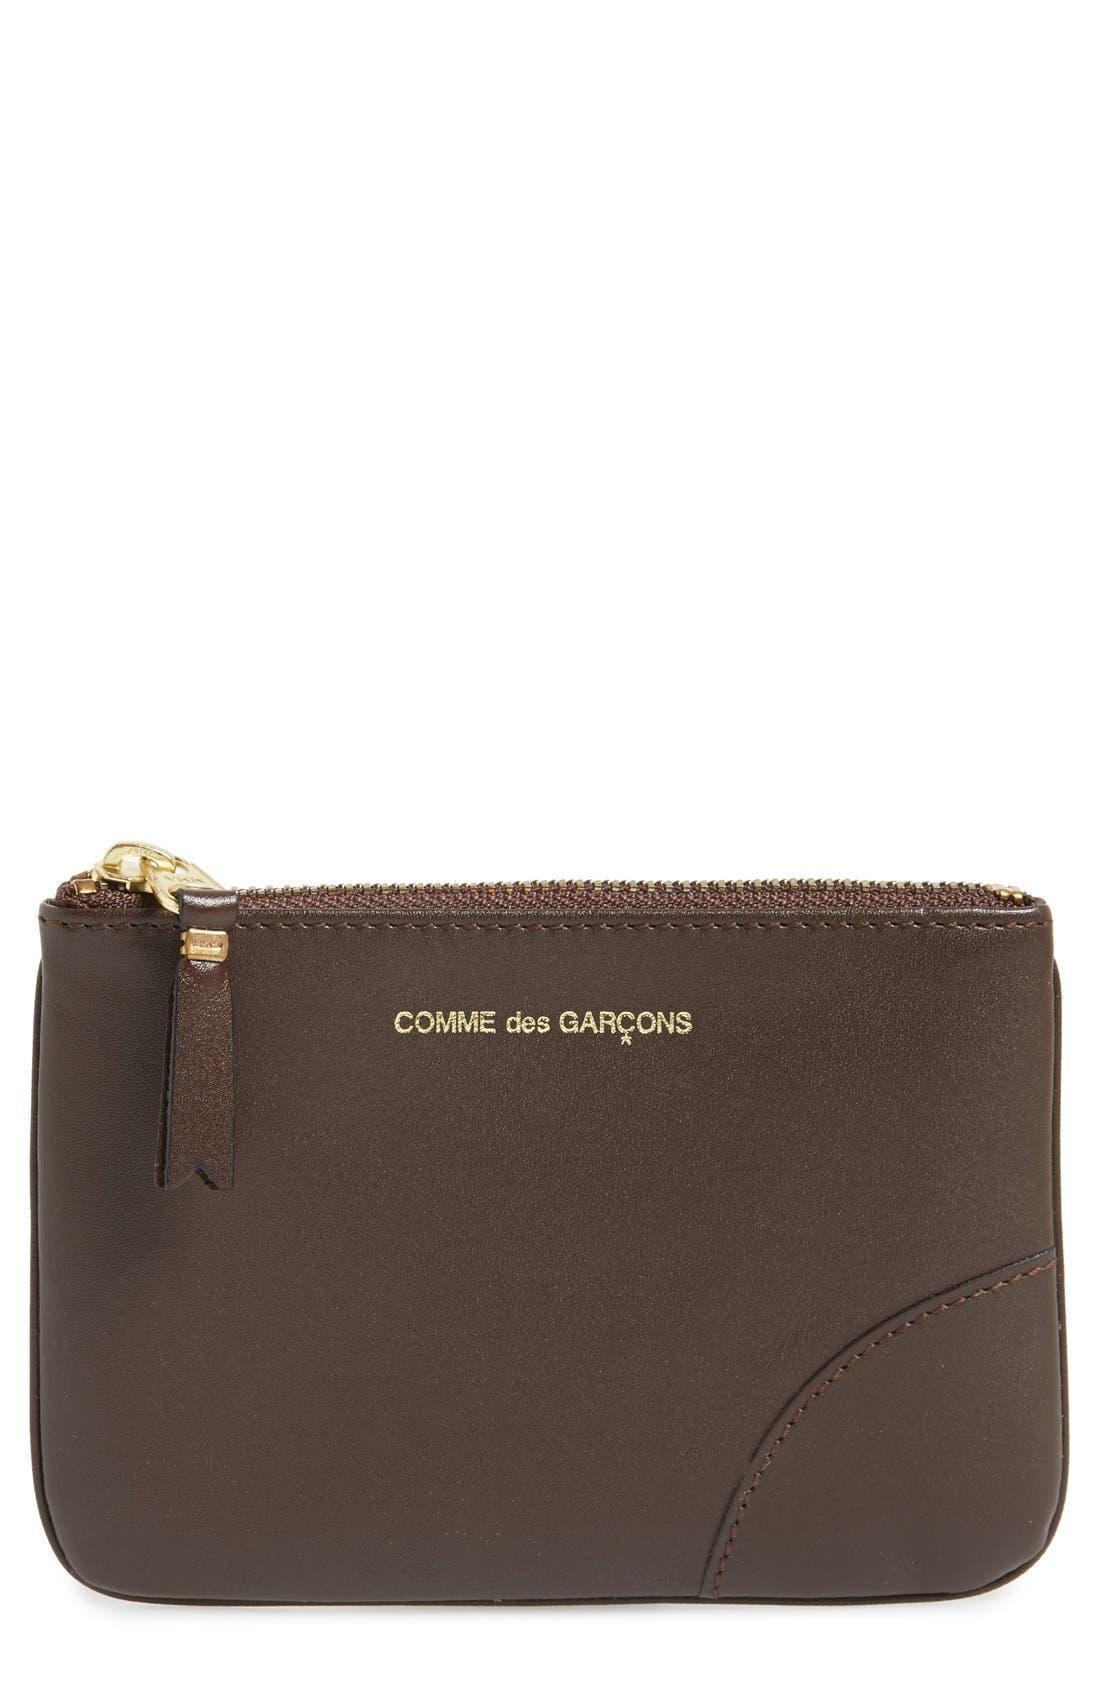 Alternate Image 1 Selected - Comme des Garçons Leather Pouch